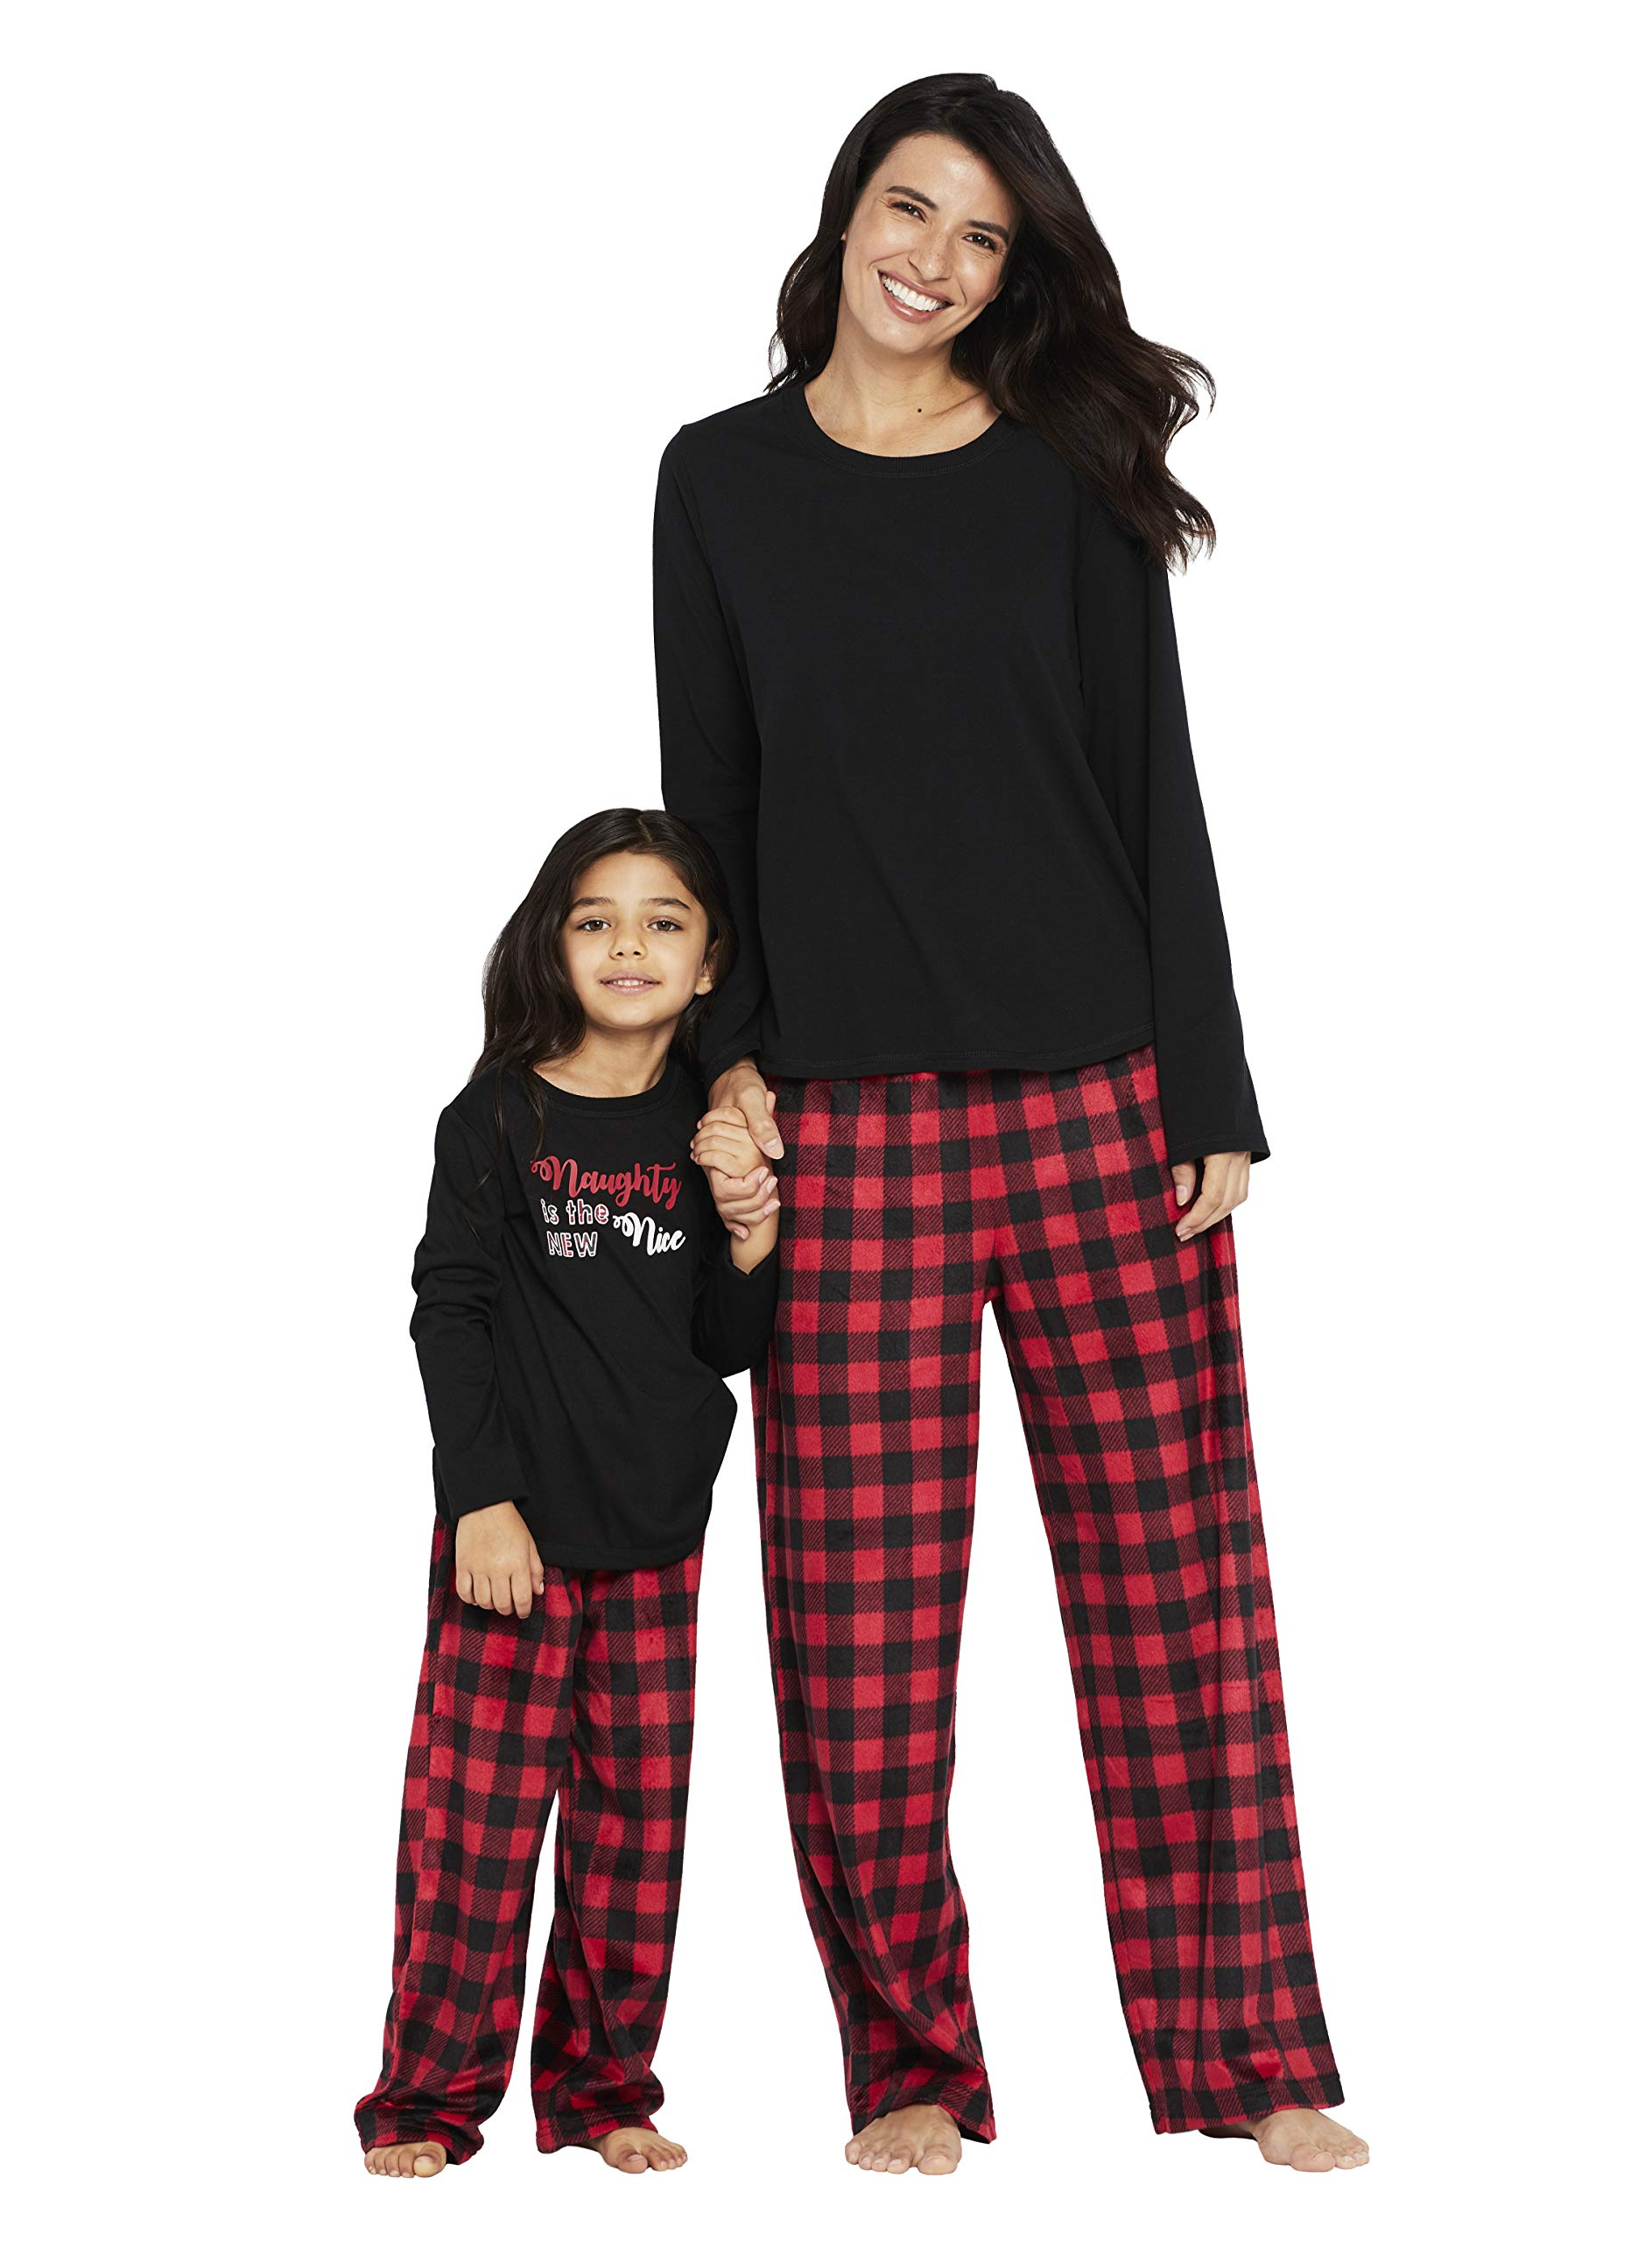 Karen Neuburger Girls' Little Family Matching Christmas Holiday Pajama Sets PJ, Buffalo Plaid red Cherry/Black Combo, Kid M by Karen Neuburger (Image #4)